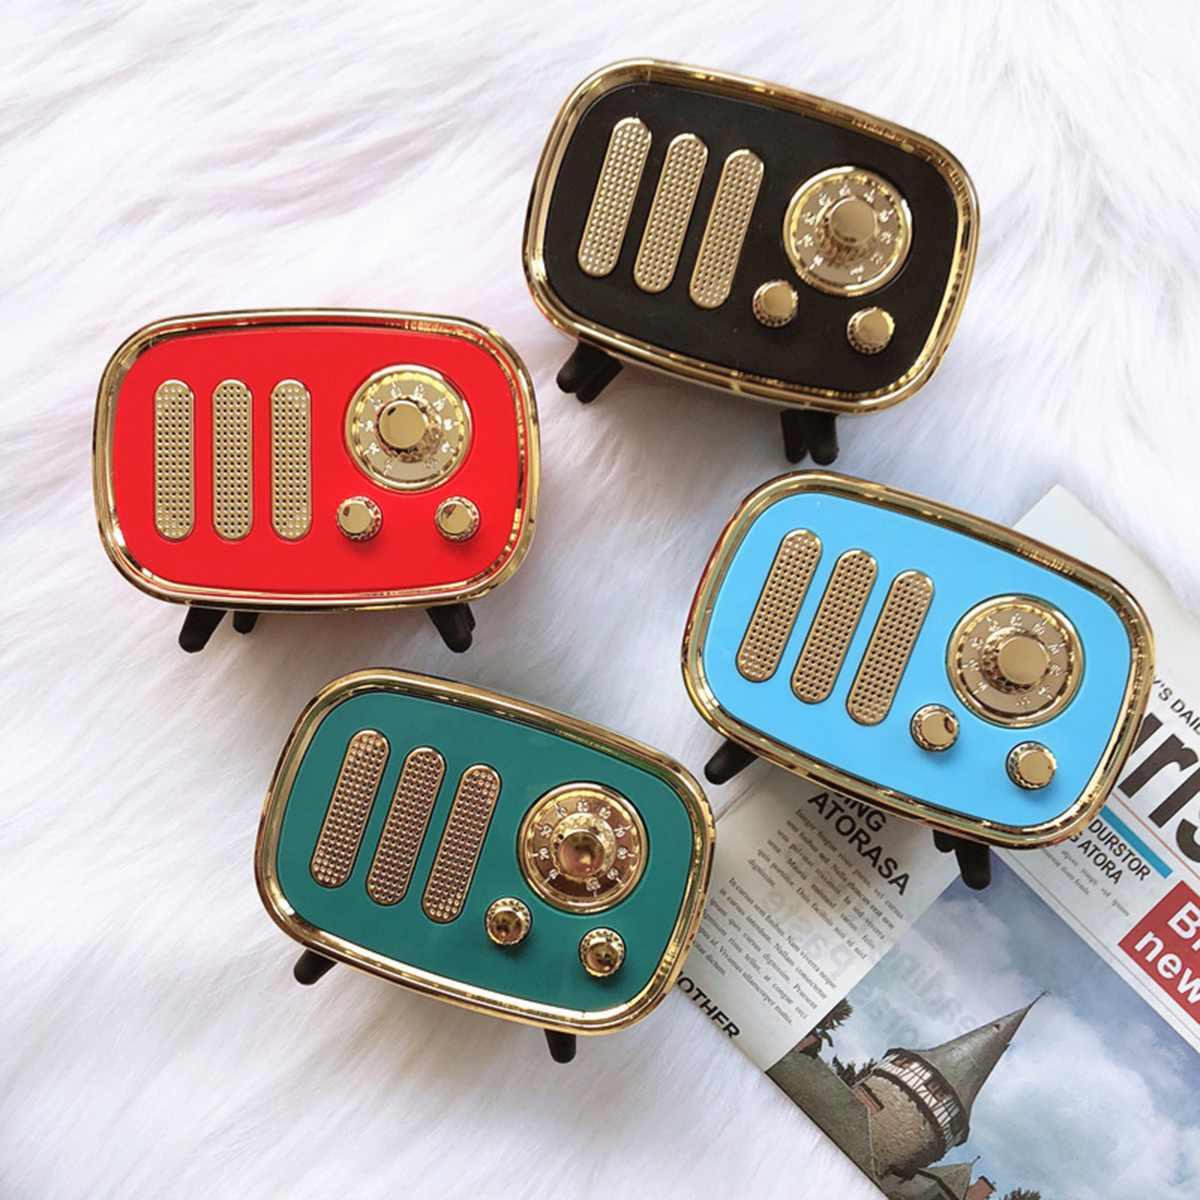 Portable bluetooth Speaker Retro Mini Wireless USB Charge bluetooth Speaker Radio TF Card Music Player HIFI Subwoofer Speaker